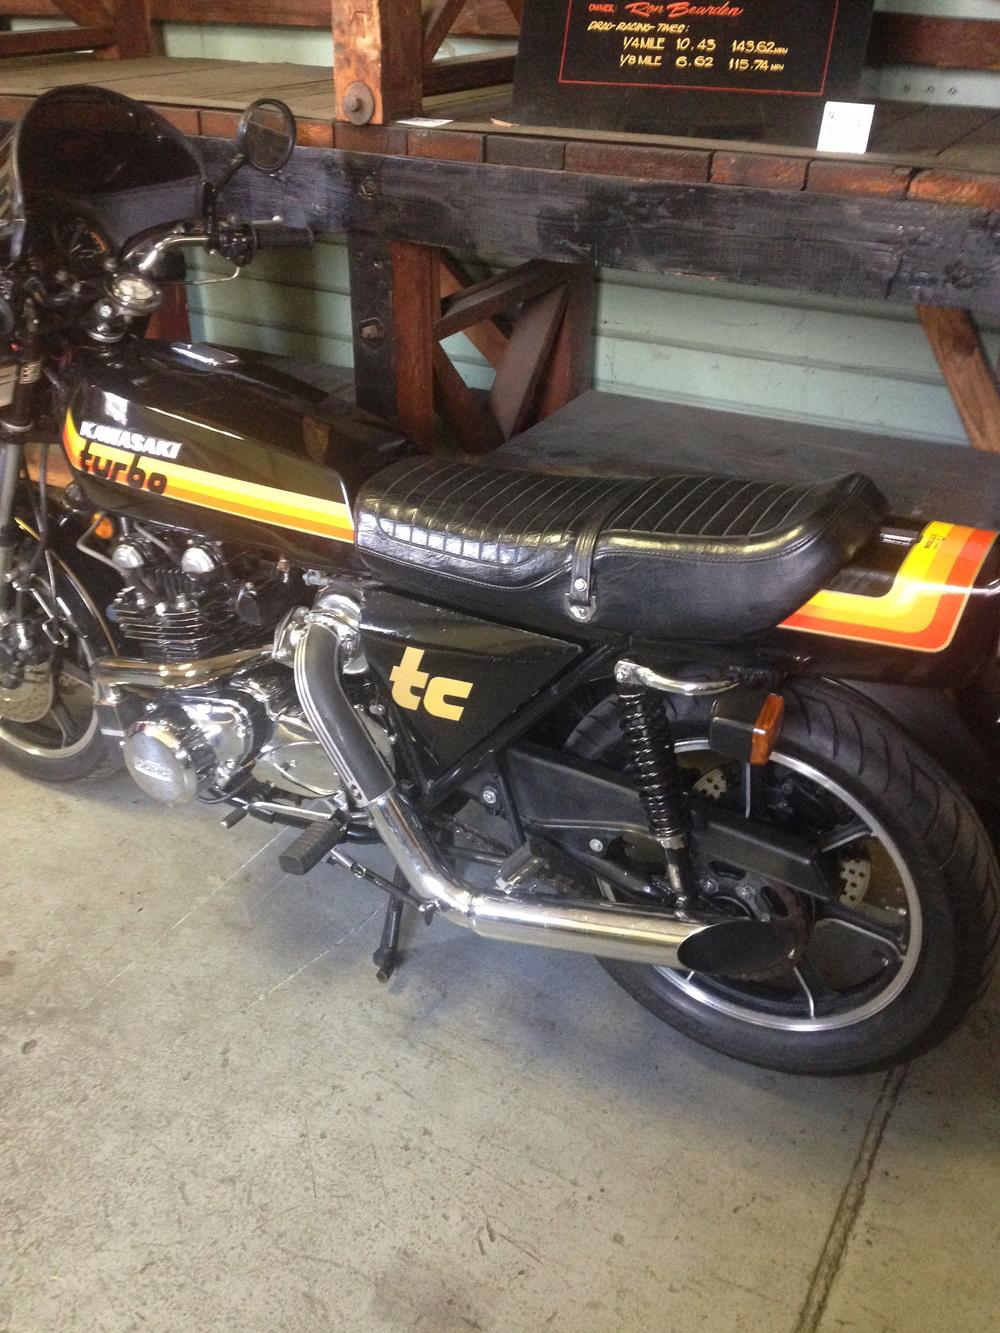 Craigslist Spokane Motorcycles By Owner | Reviewmotors.co